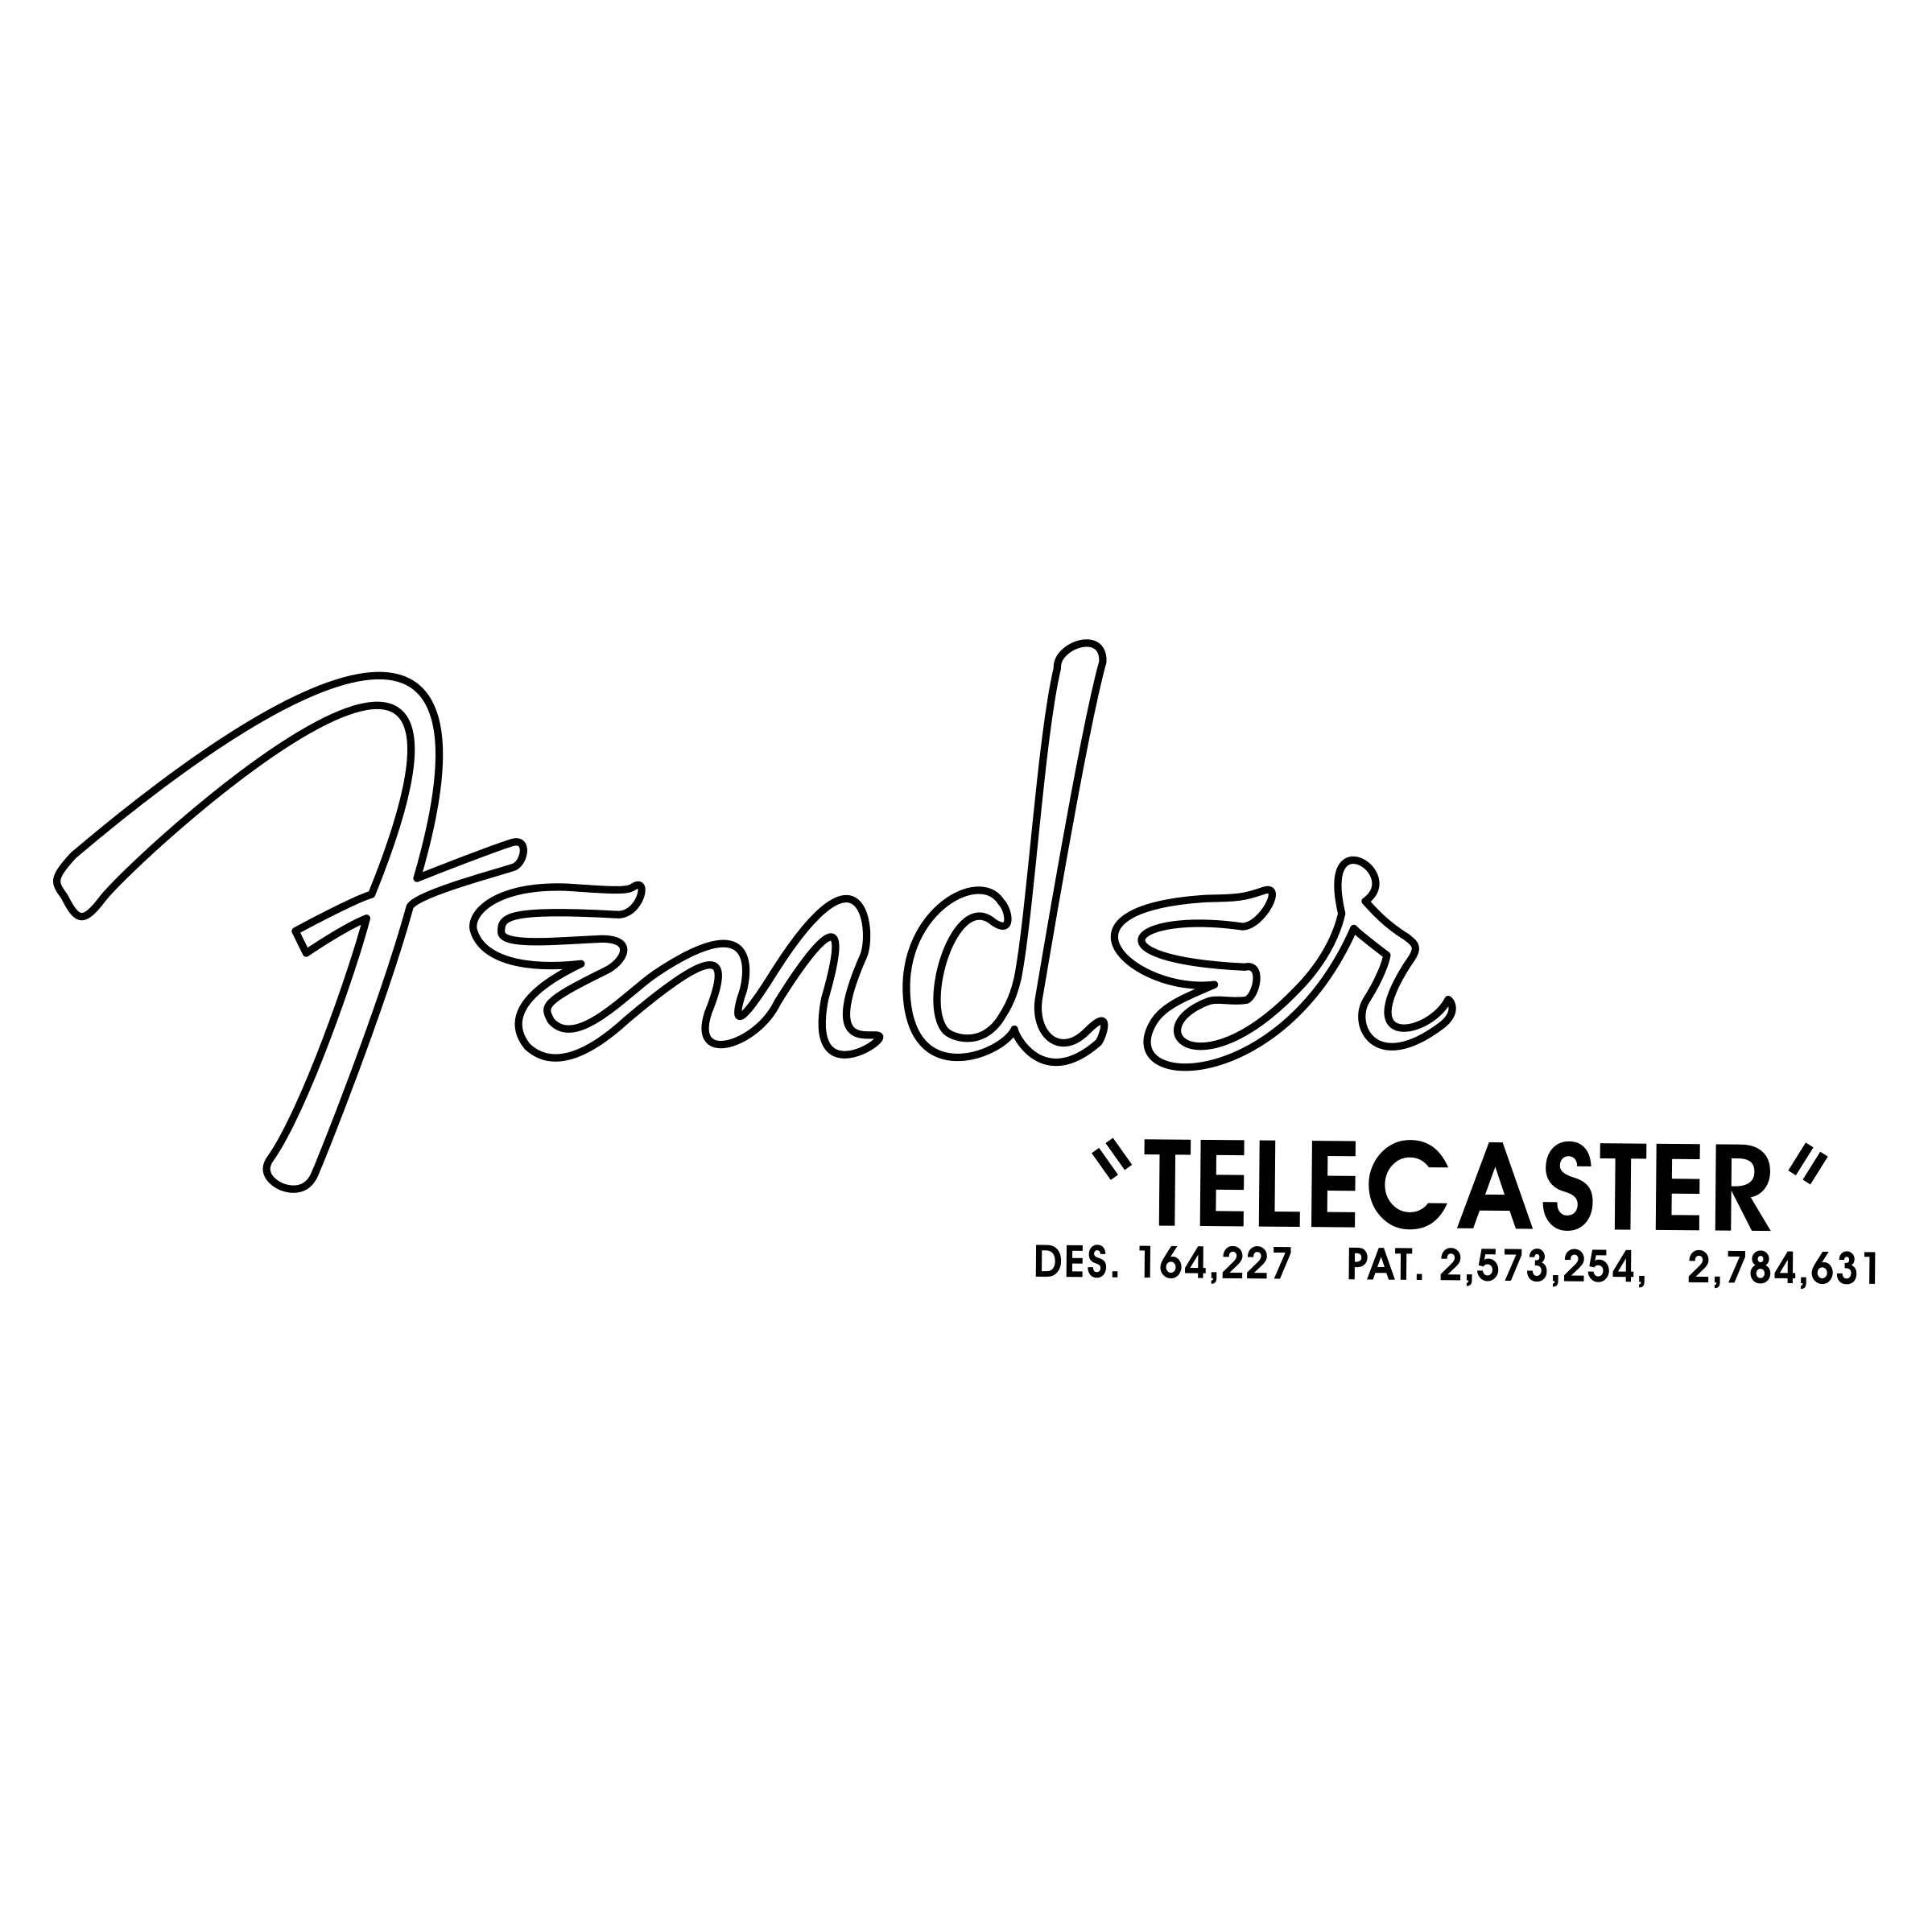 fender logo png wwwpixsharkcom images galleries with